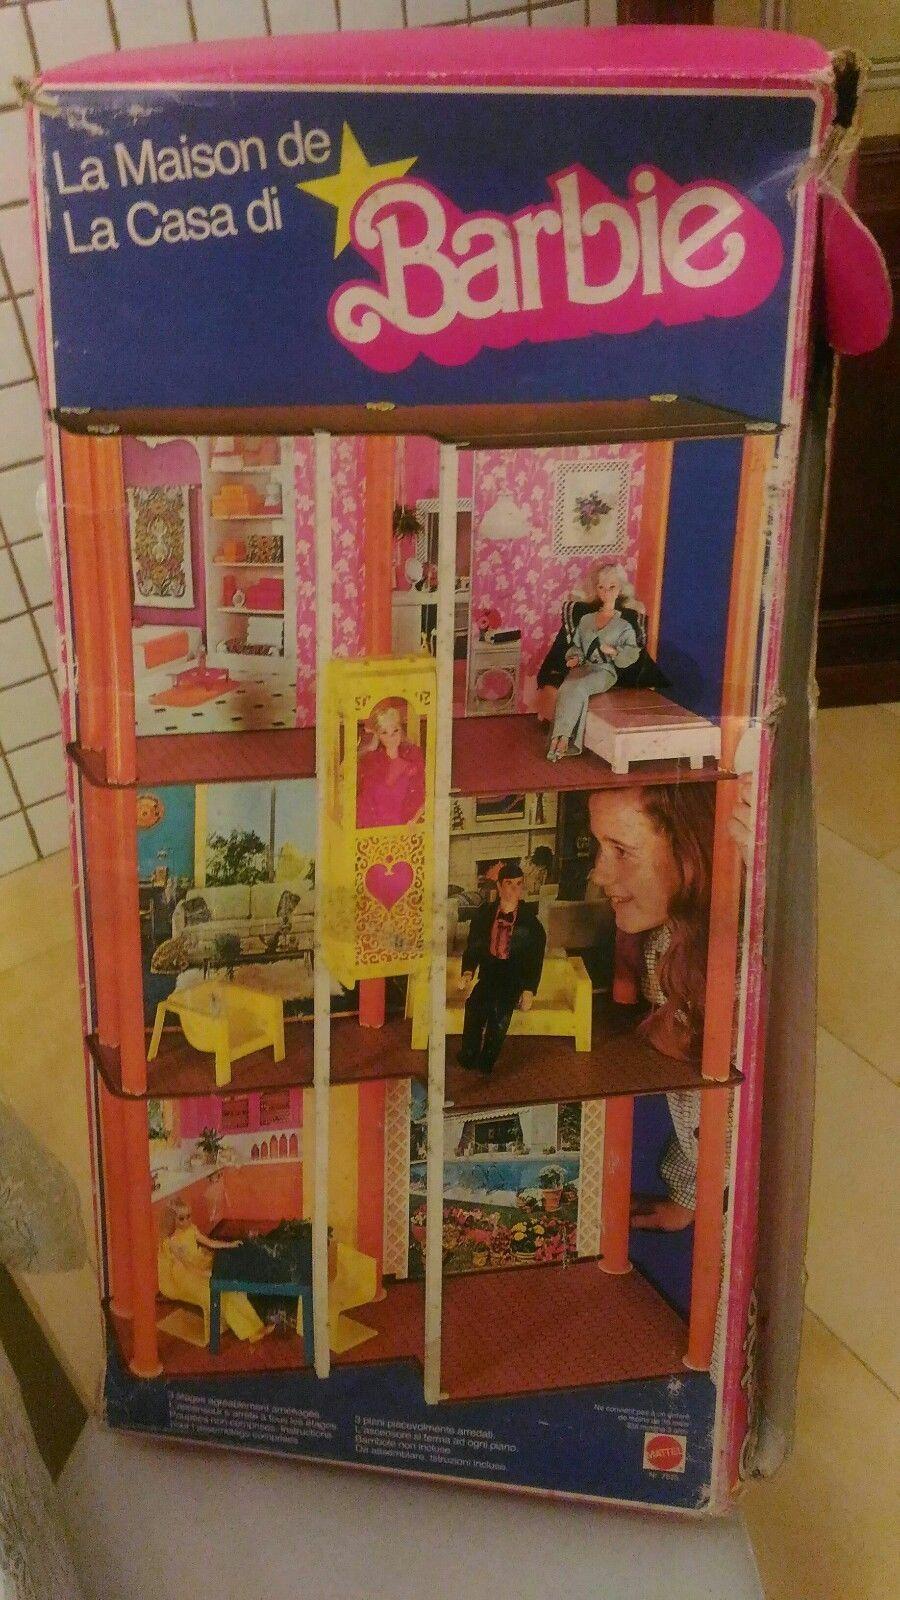 La Casa di Barbie   eBay   Barbie, Vintage barbie e Giocattoli vintage